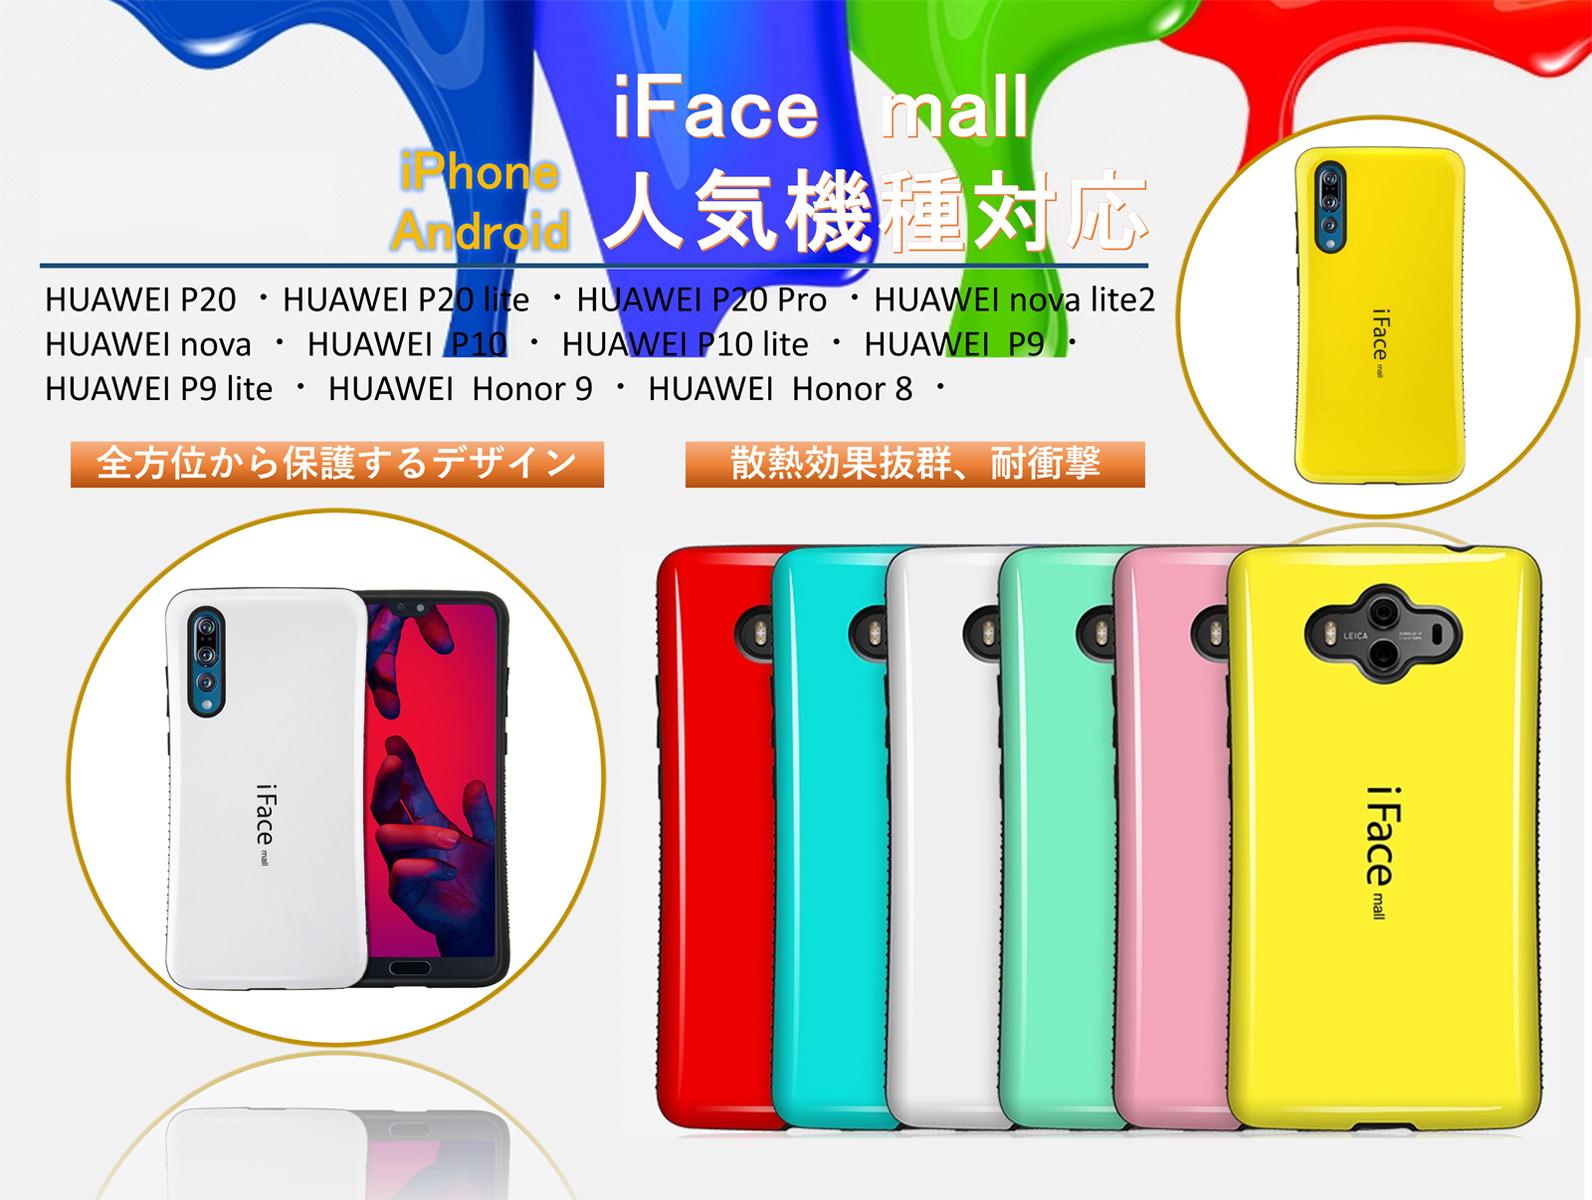 iface mall iFacemall huawei P20 Pro P20 P20 lite honor8 honor9 P9 P9 lite  P10 lite nova lite2 nova lite smartphone case Kay ska ruffle case